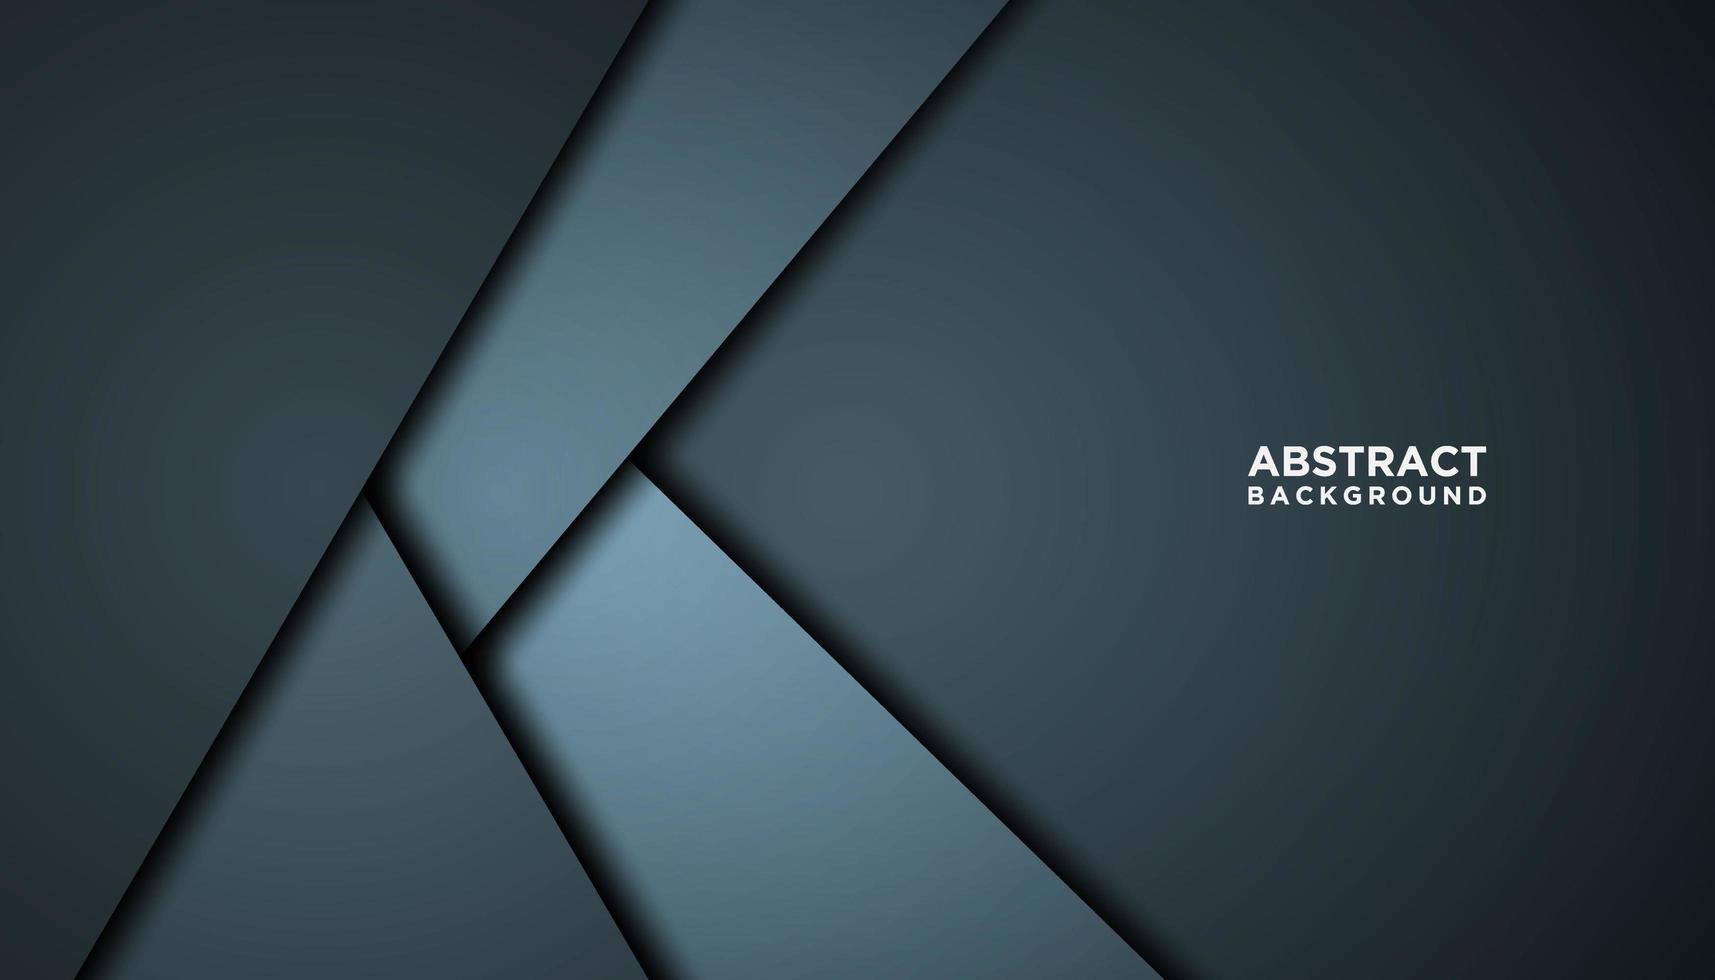 abstrakter grauer innovativer Hintergrund vektor